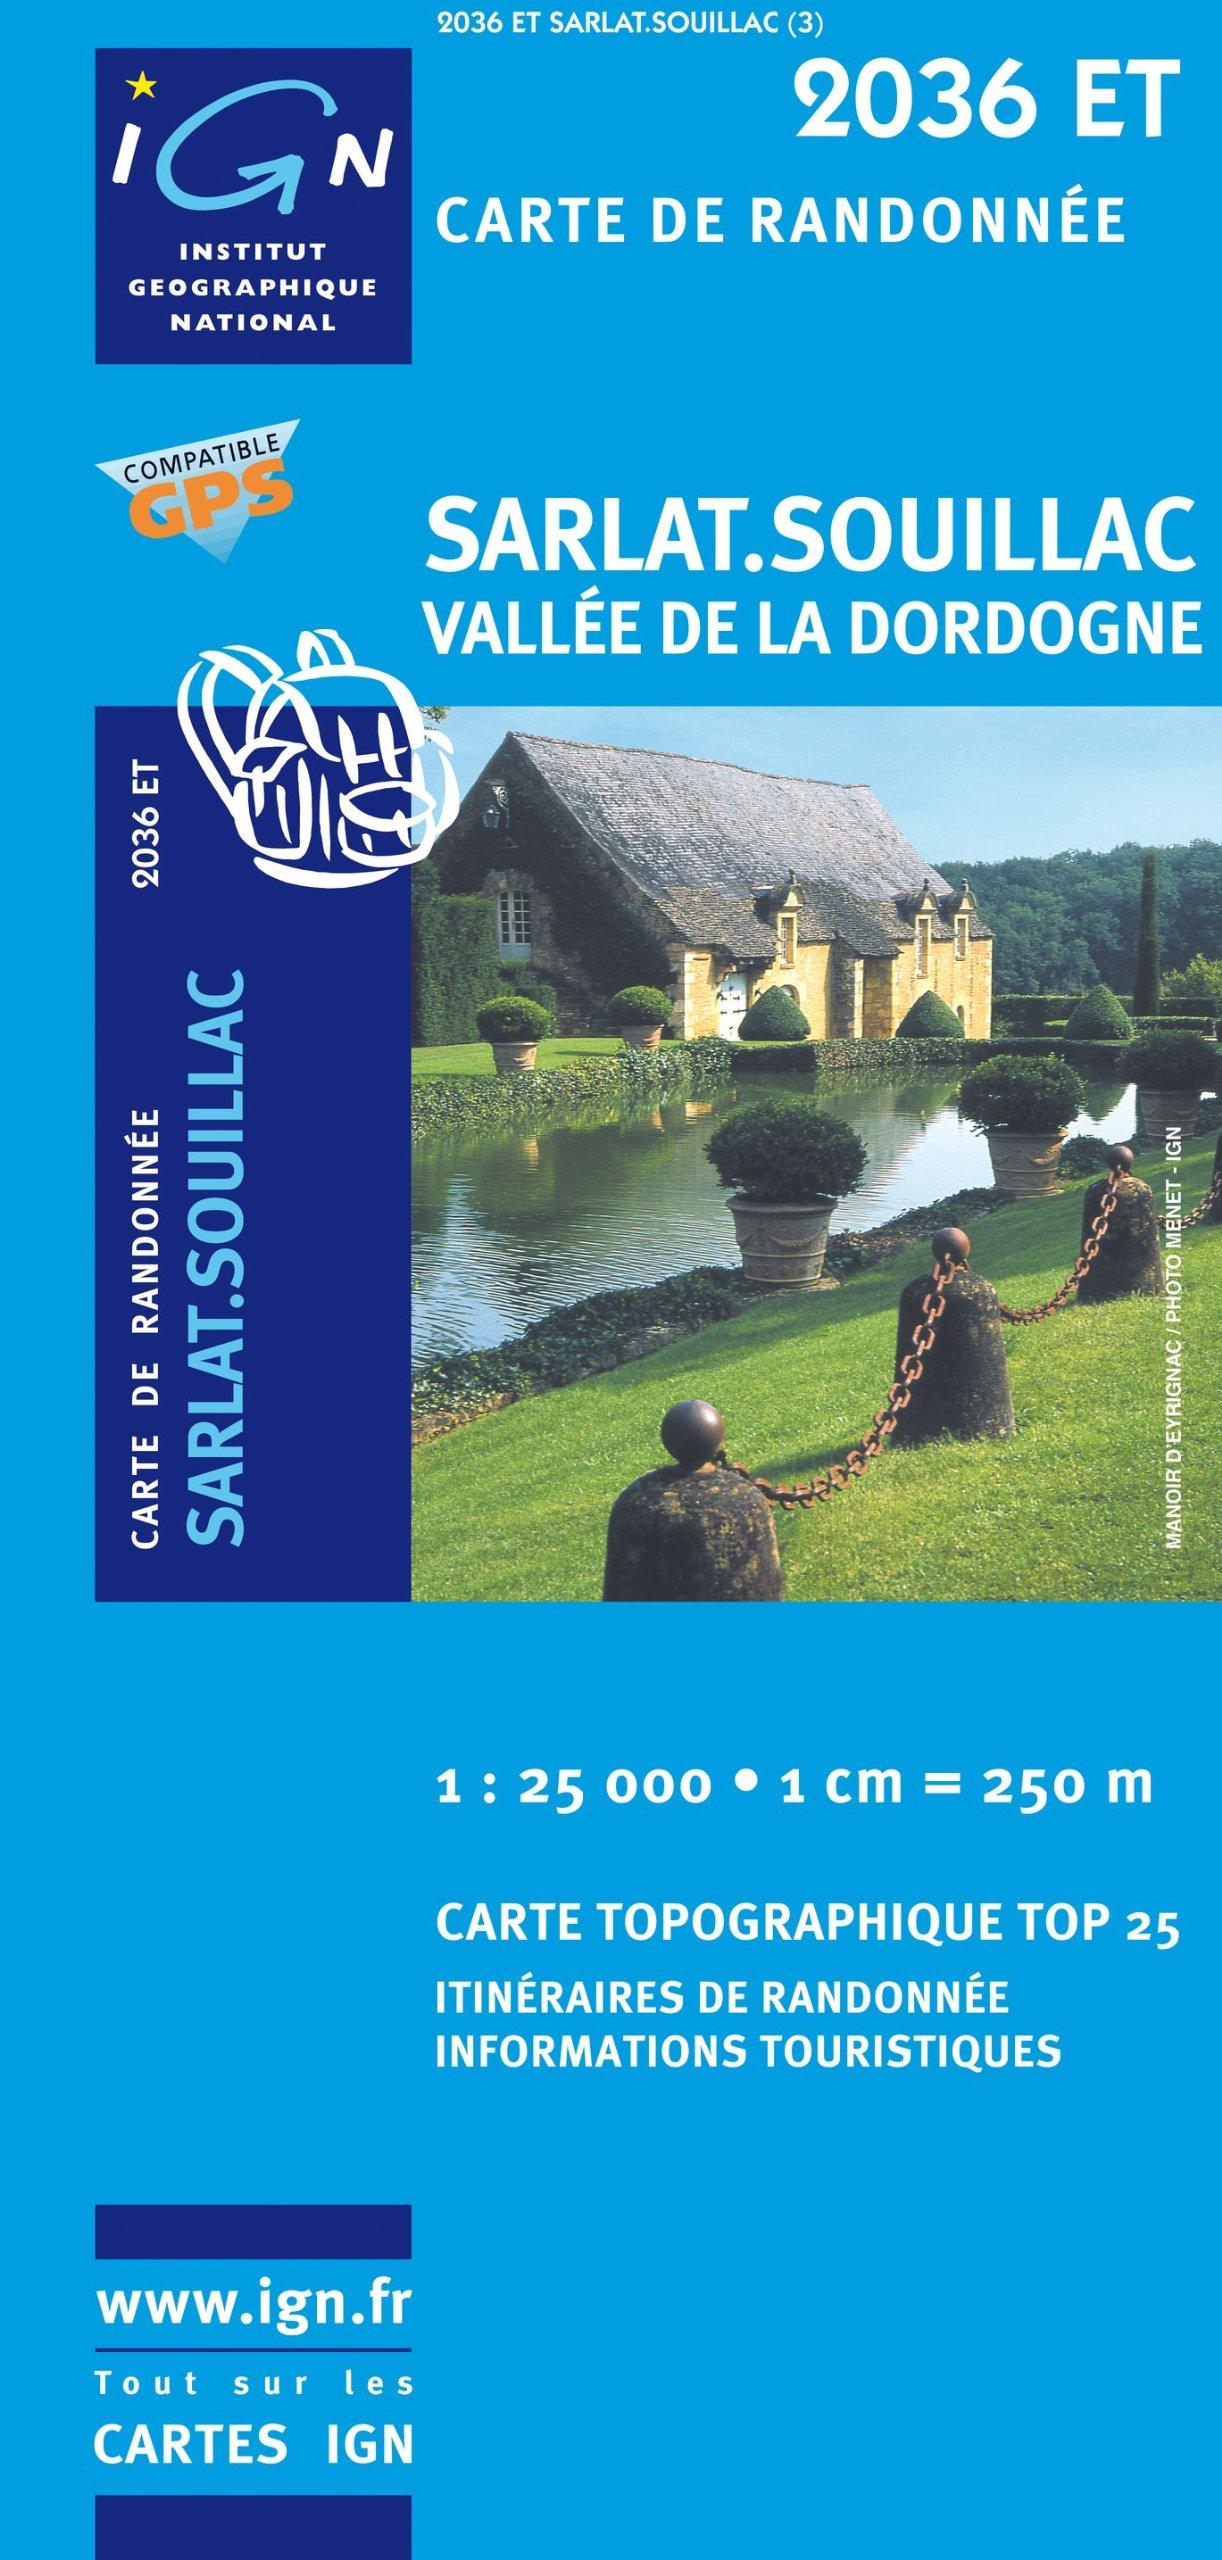 2036ET SARLAT/SOUILLAC (Anglais) Carte – Carte pliée, 22 janvier 2008 COLLECTIF IGN 2758506165 Karten / Stadtpläne / Europa